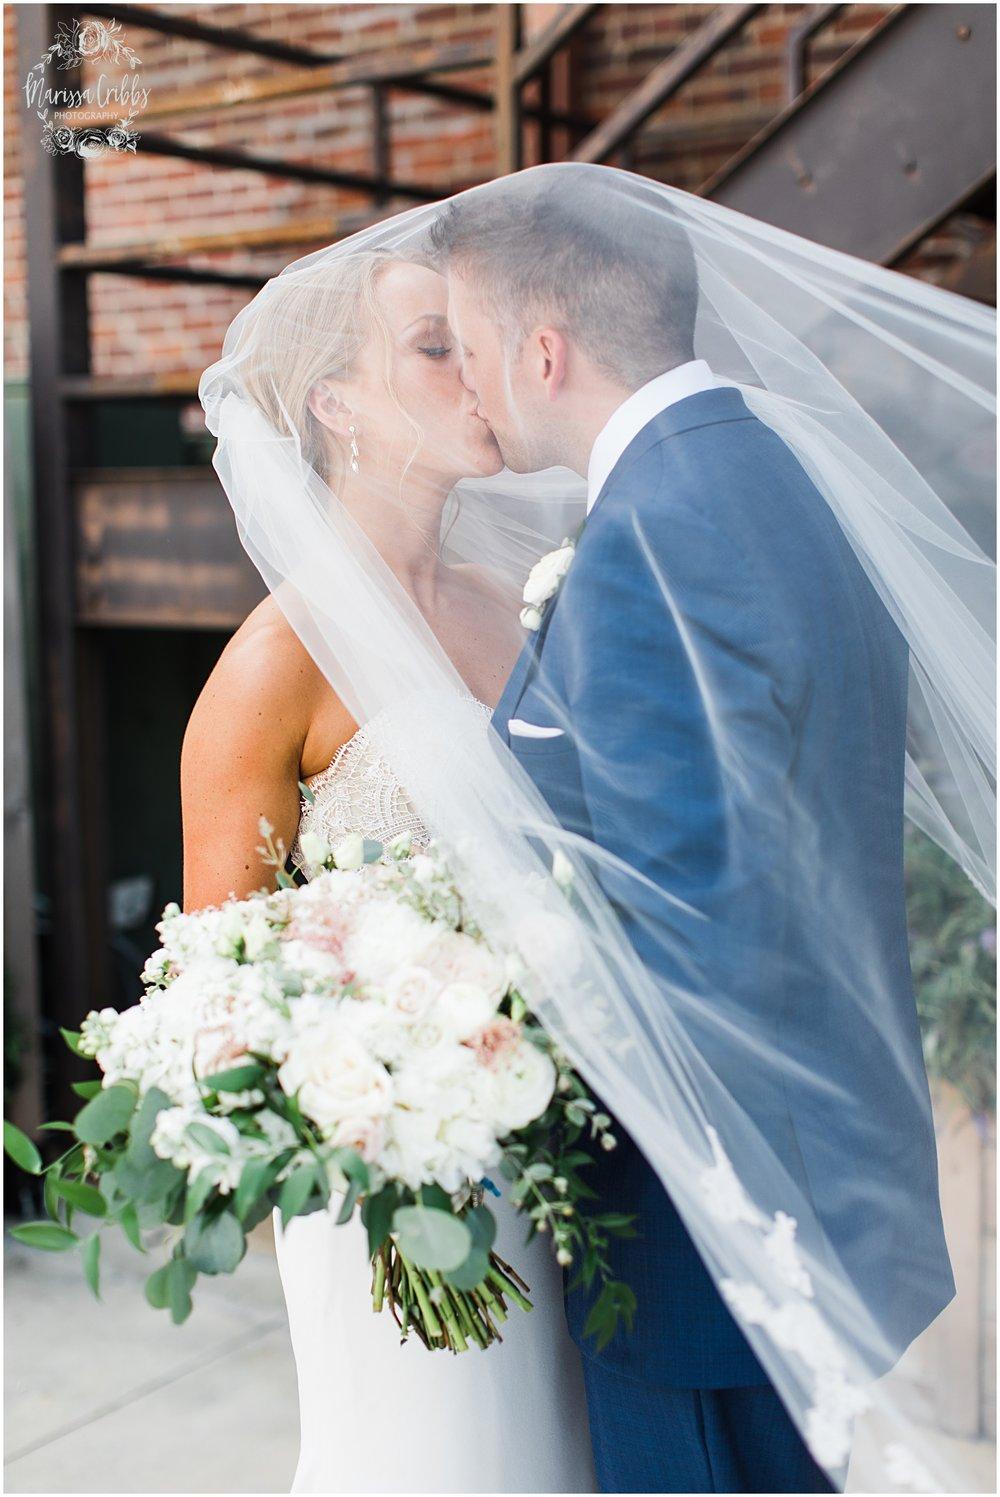 MAGNOLIA VENUE WEDDING | CHARLIE & NATALIE | MARISSA CRIBBS PHOTOGRAPHY_5743.jpg